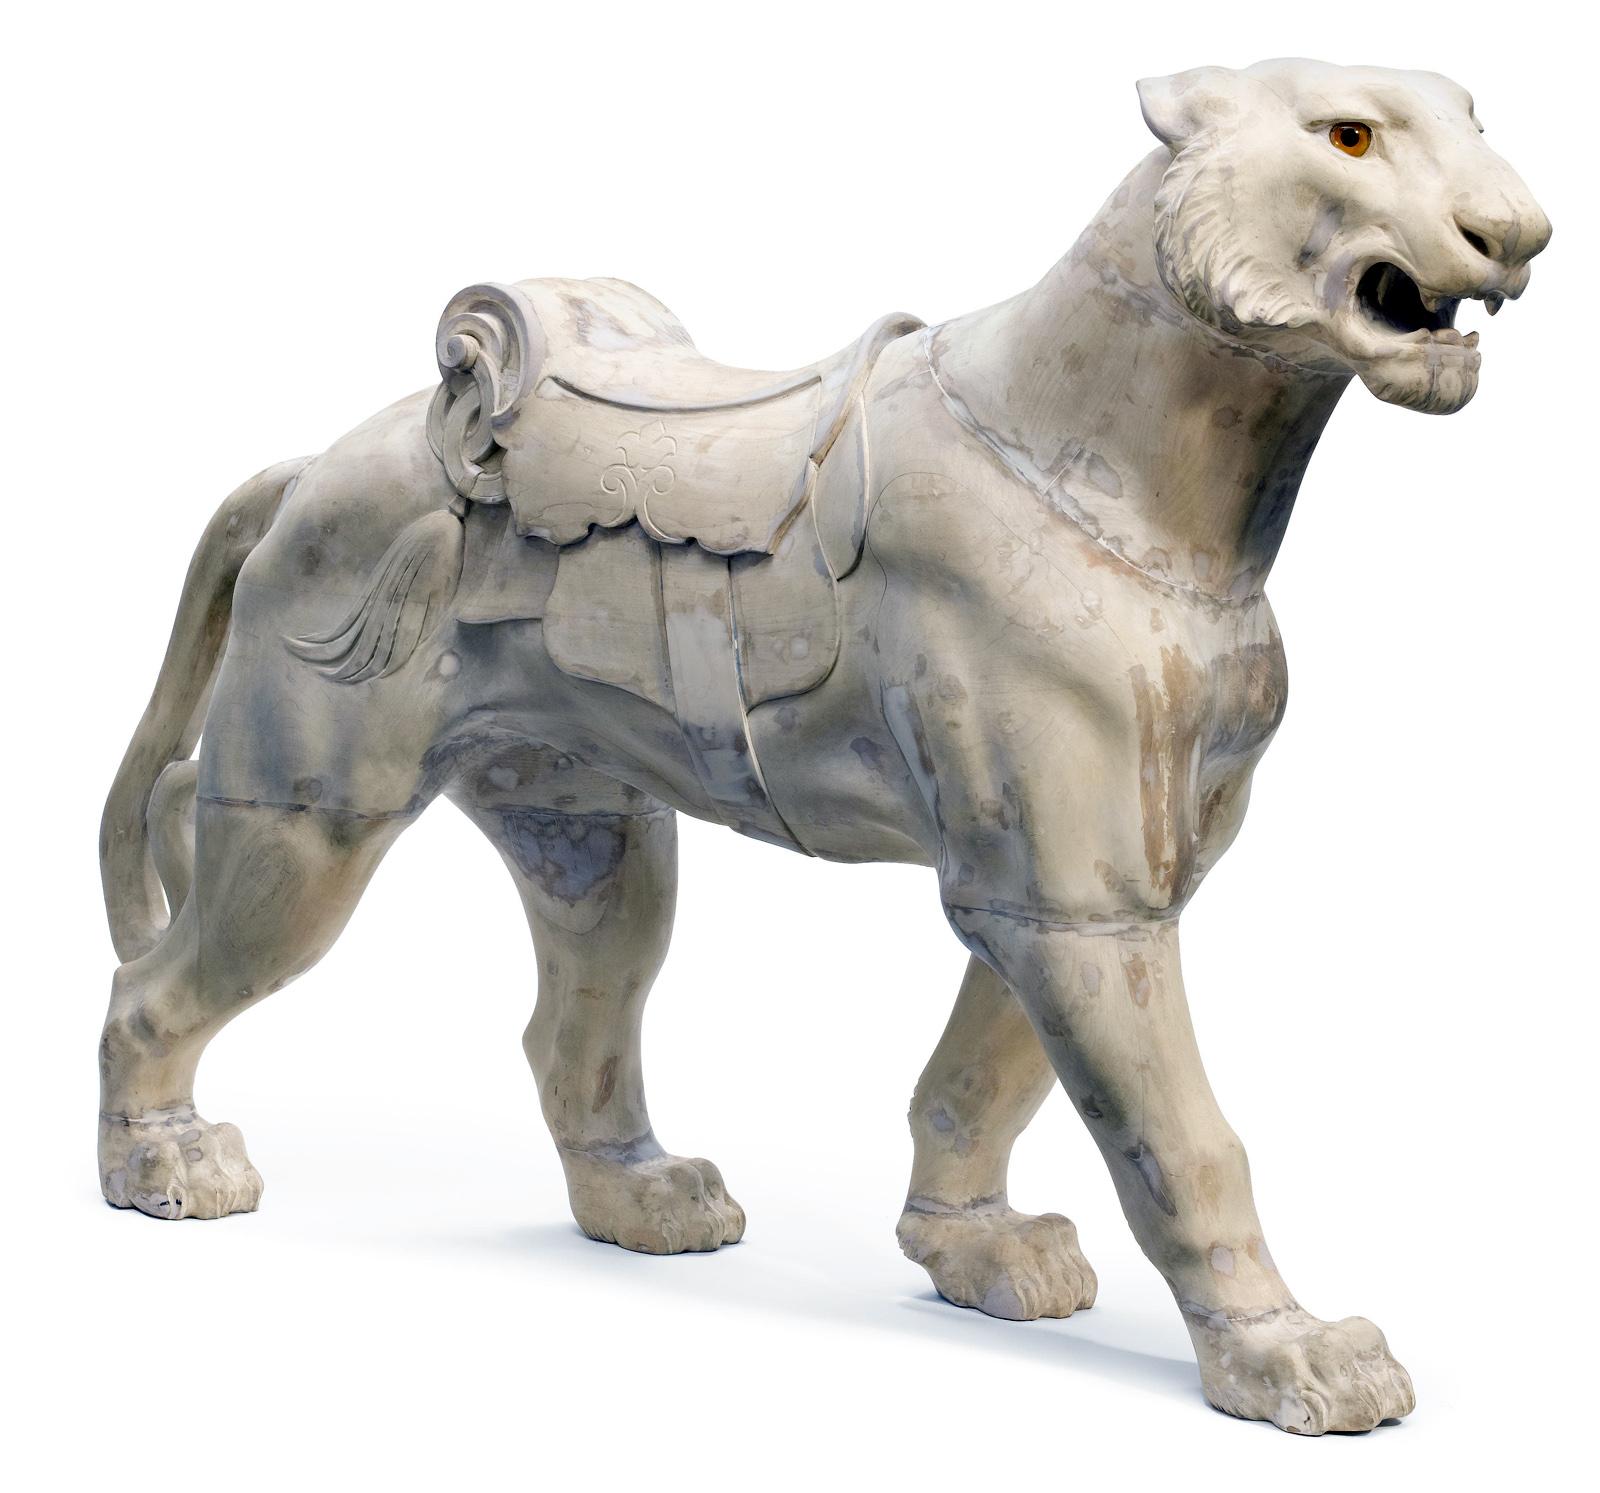 Daniel-C-Muller-carousel-tiger